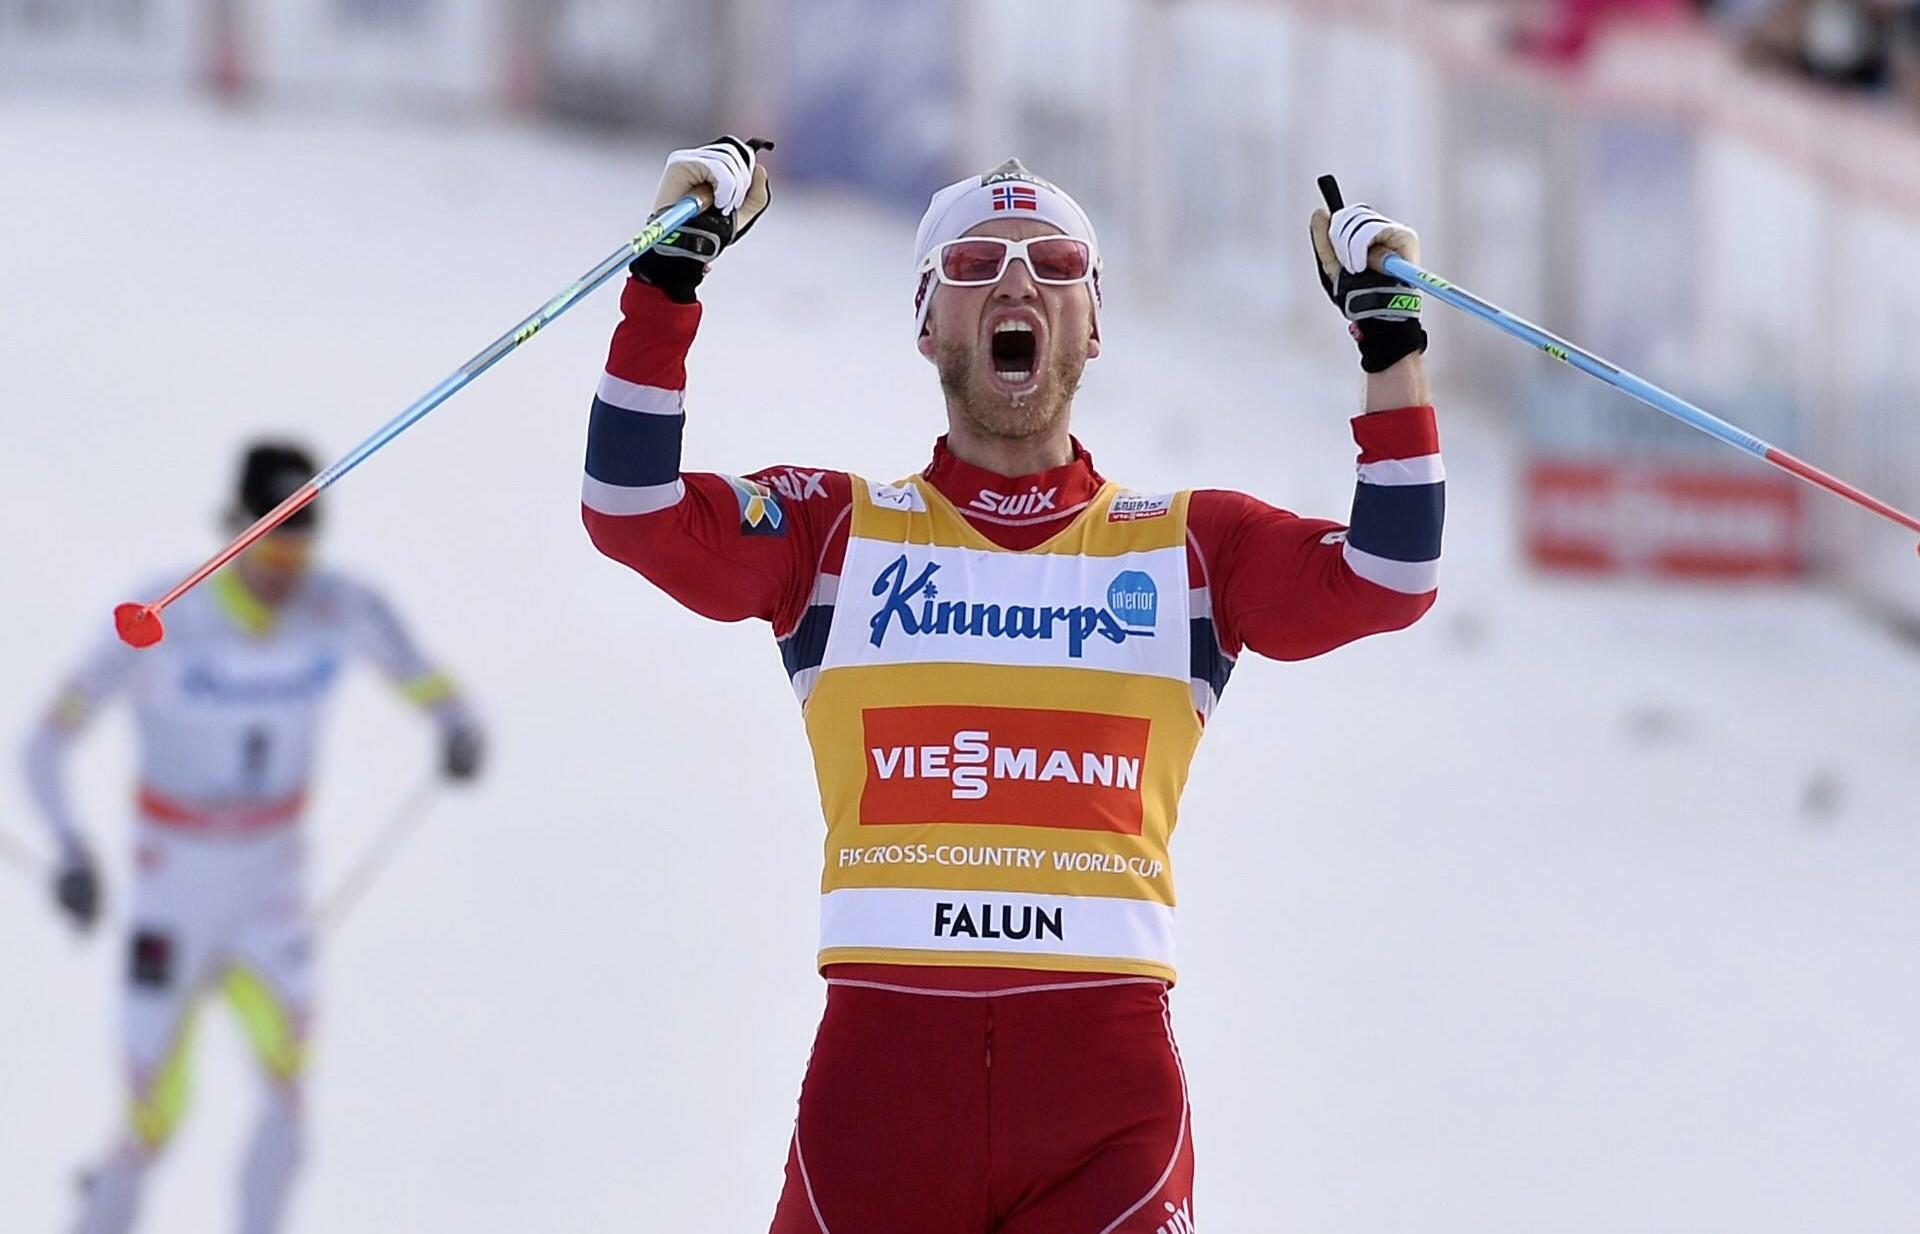 Снегоход сбил норвежского лыжника Сундбю впроцессе марафона